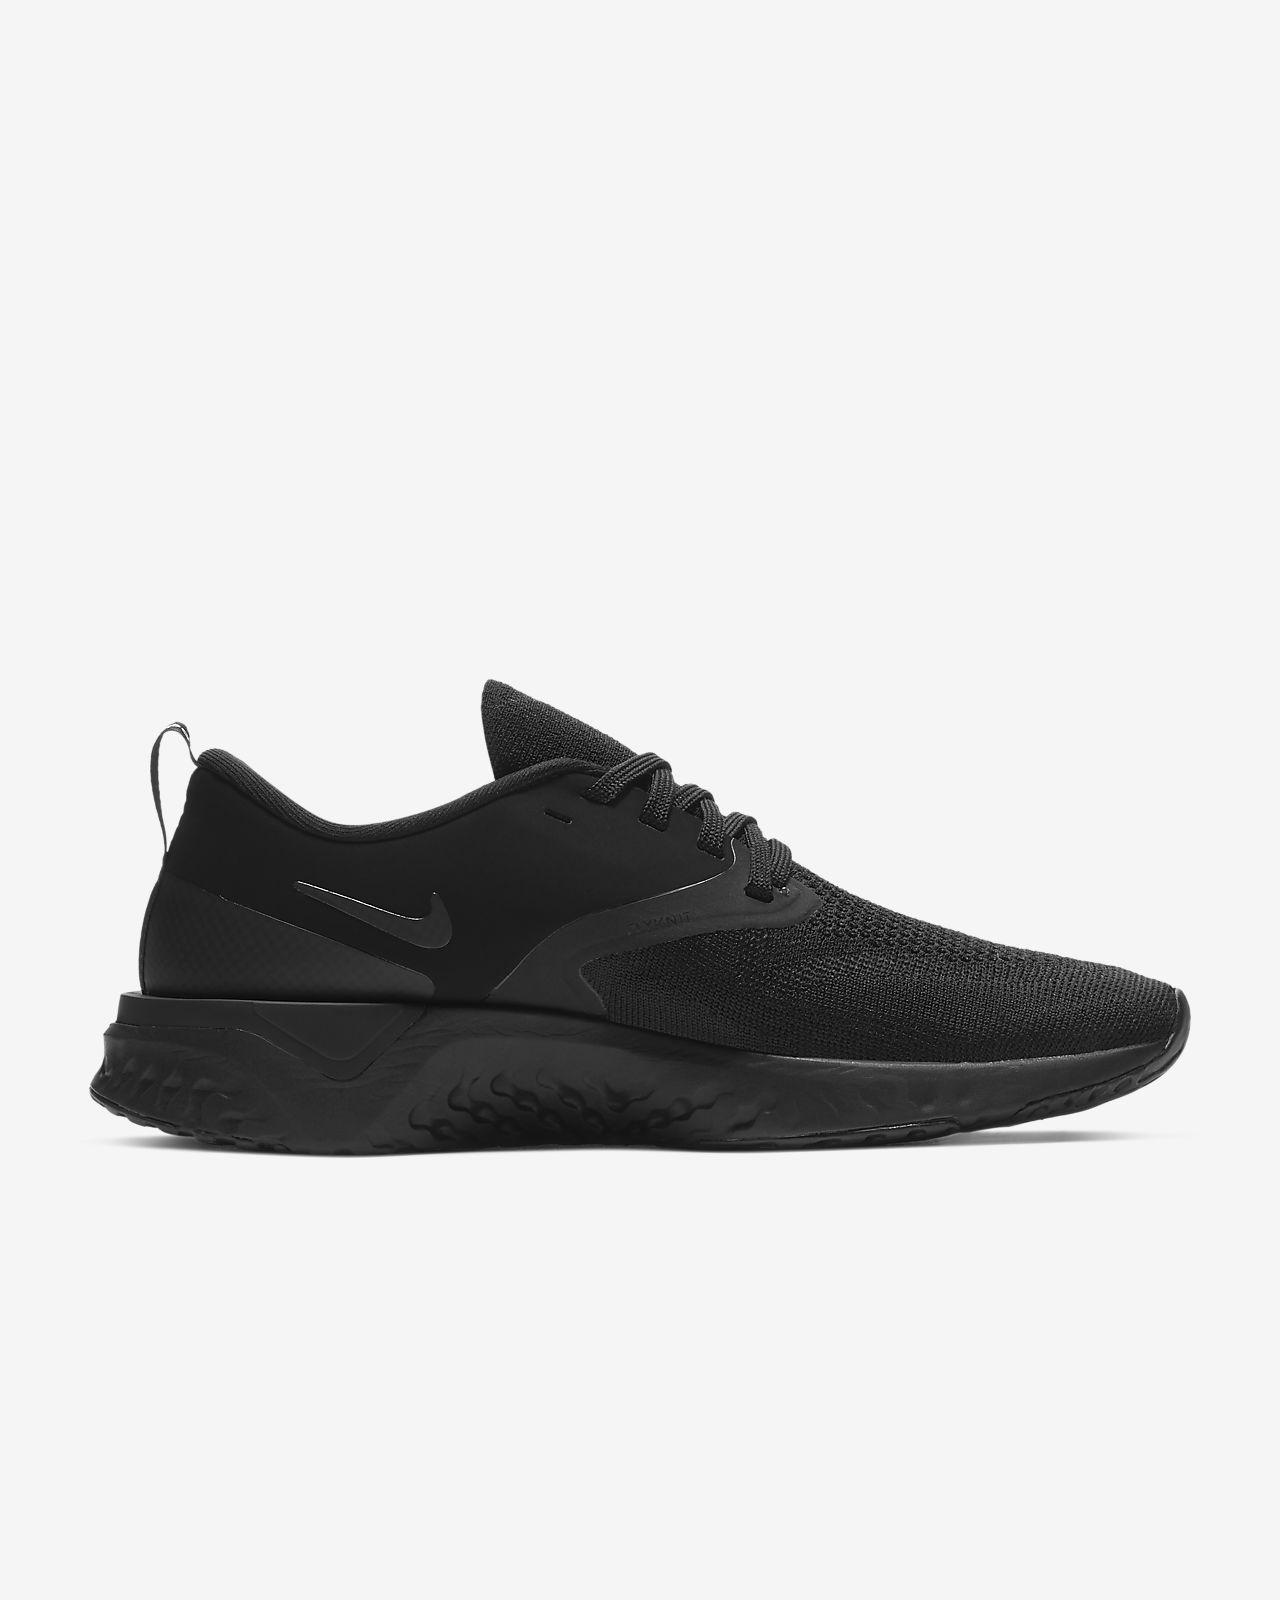 la meilleure attitude c2dfe 31674 Running React Odyssey 2 Chaussure Nike Flyknit Femme De Pour ...